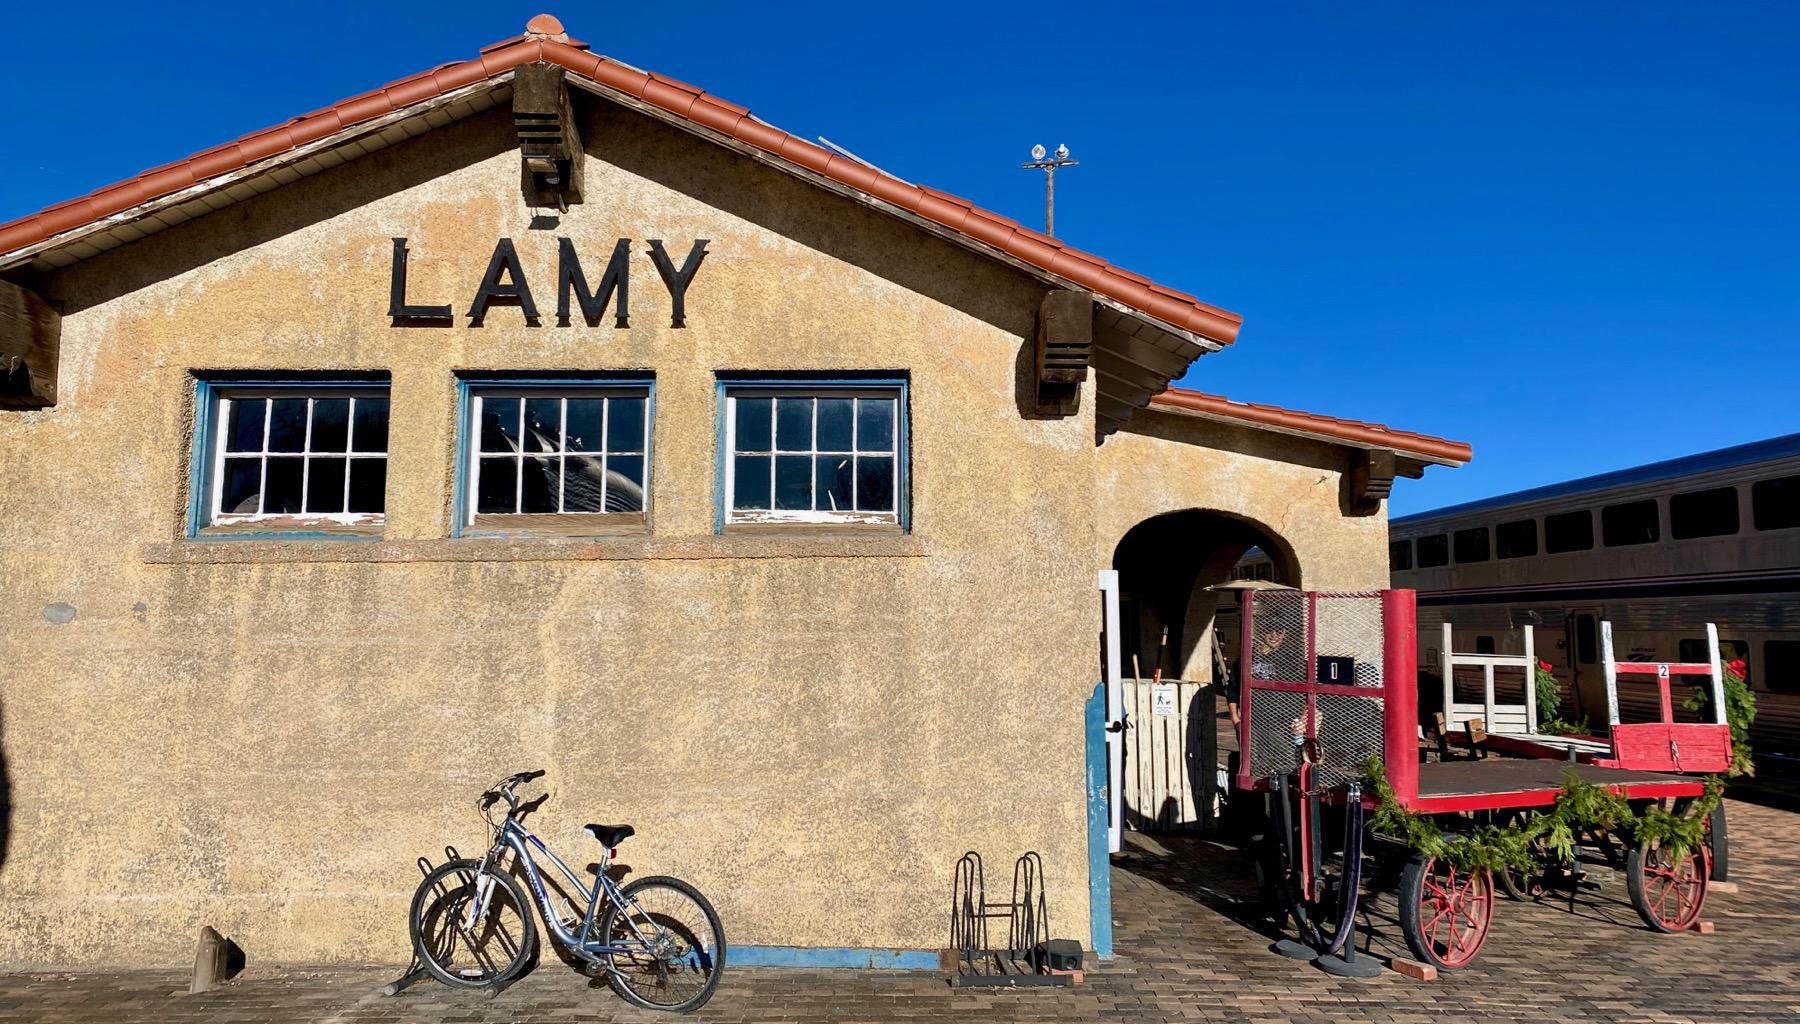 Lamy depot